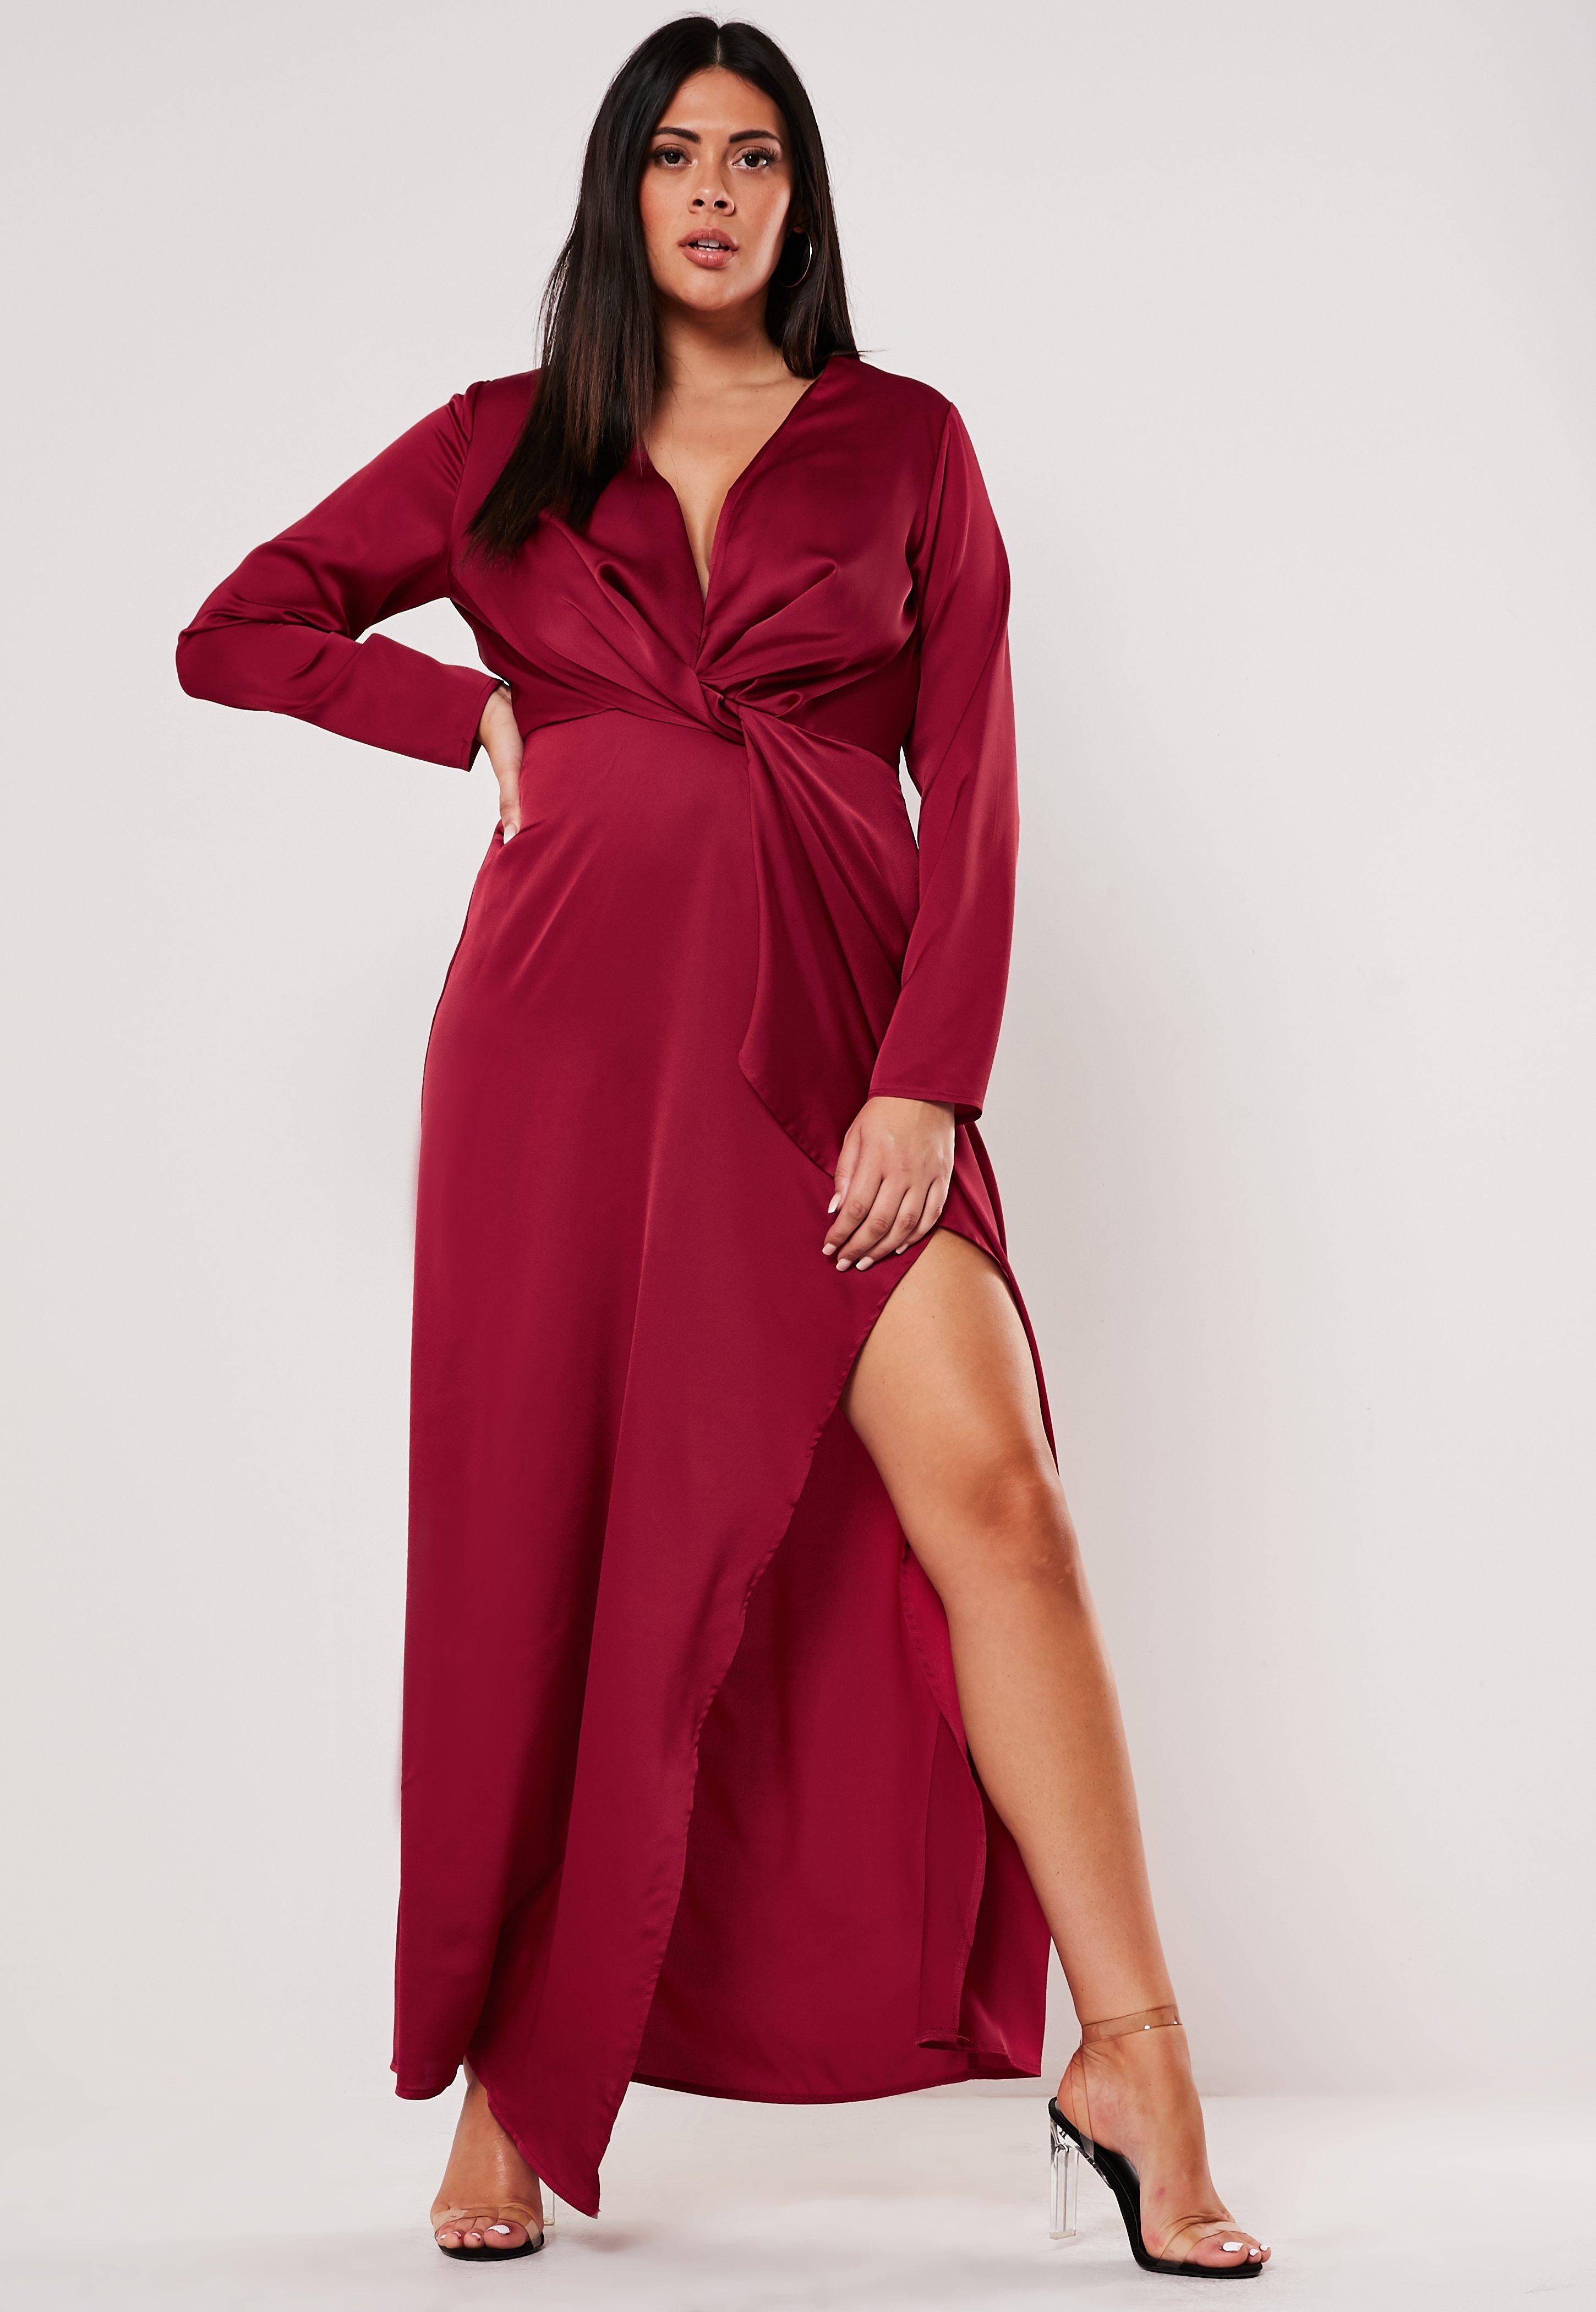 Plus Size Burgundy Satin Wrap Maxi Dress